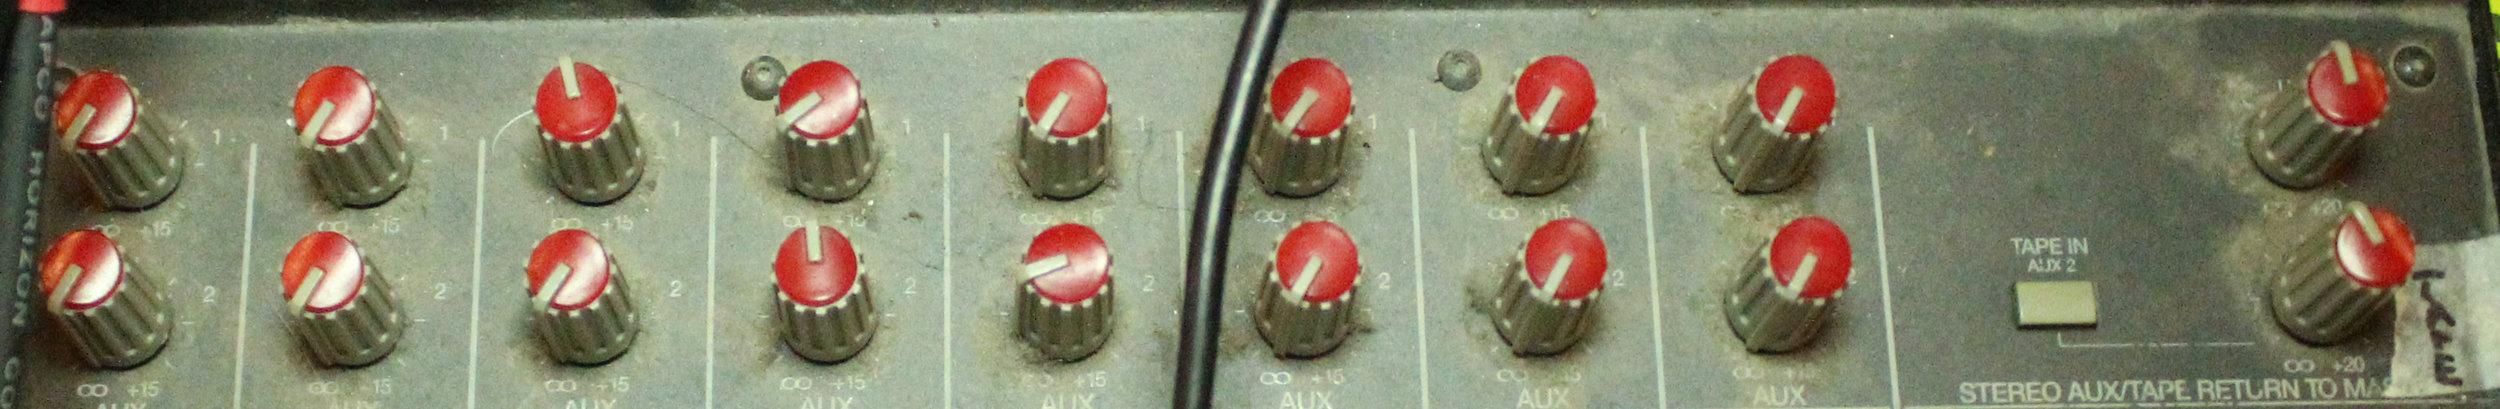 mixerB.jpg